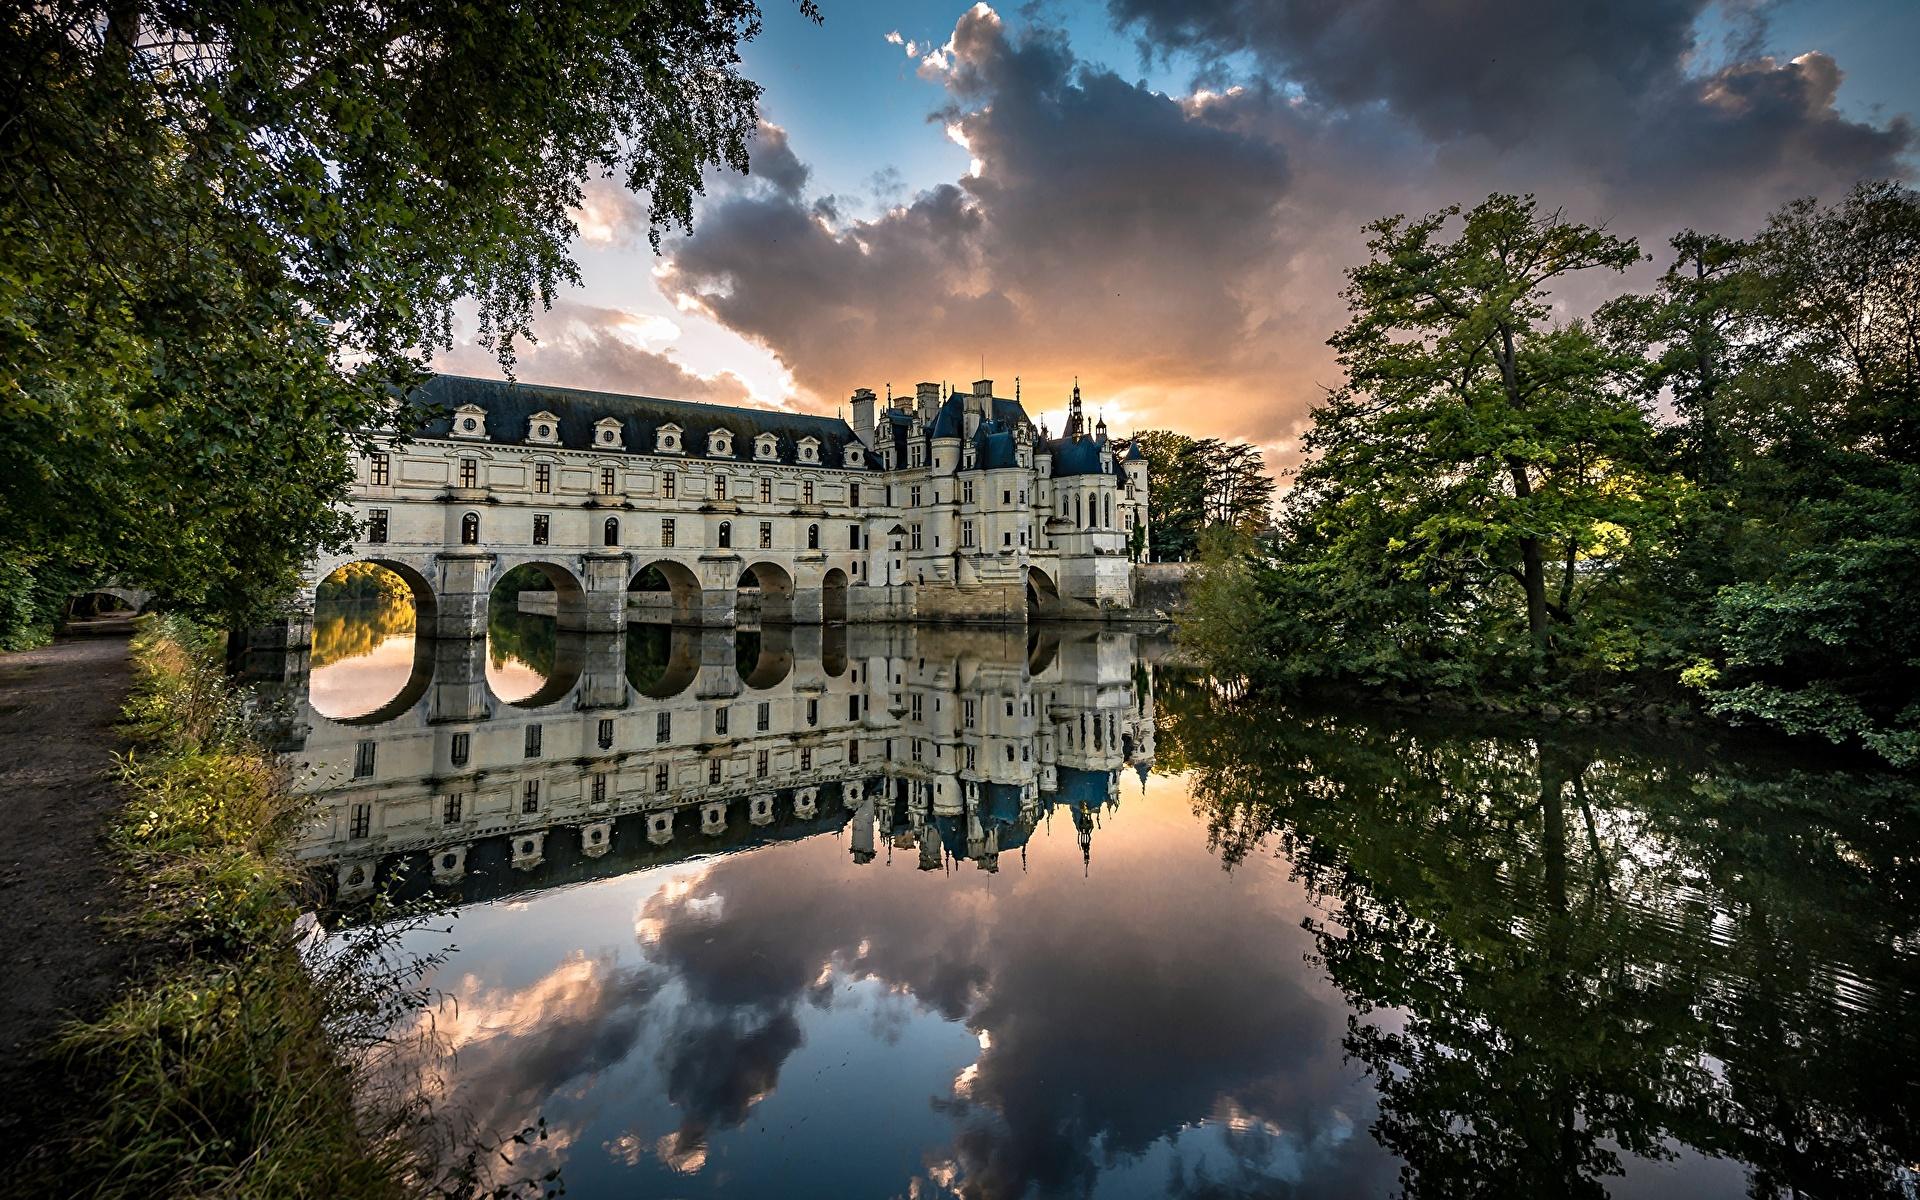 Фото Франция башни Château de Chenonceau замок Природа Отражение Реки деревьев 1920x1200 Башня Замки отражении отражается река речка дерево дерева Деревья